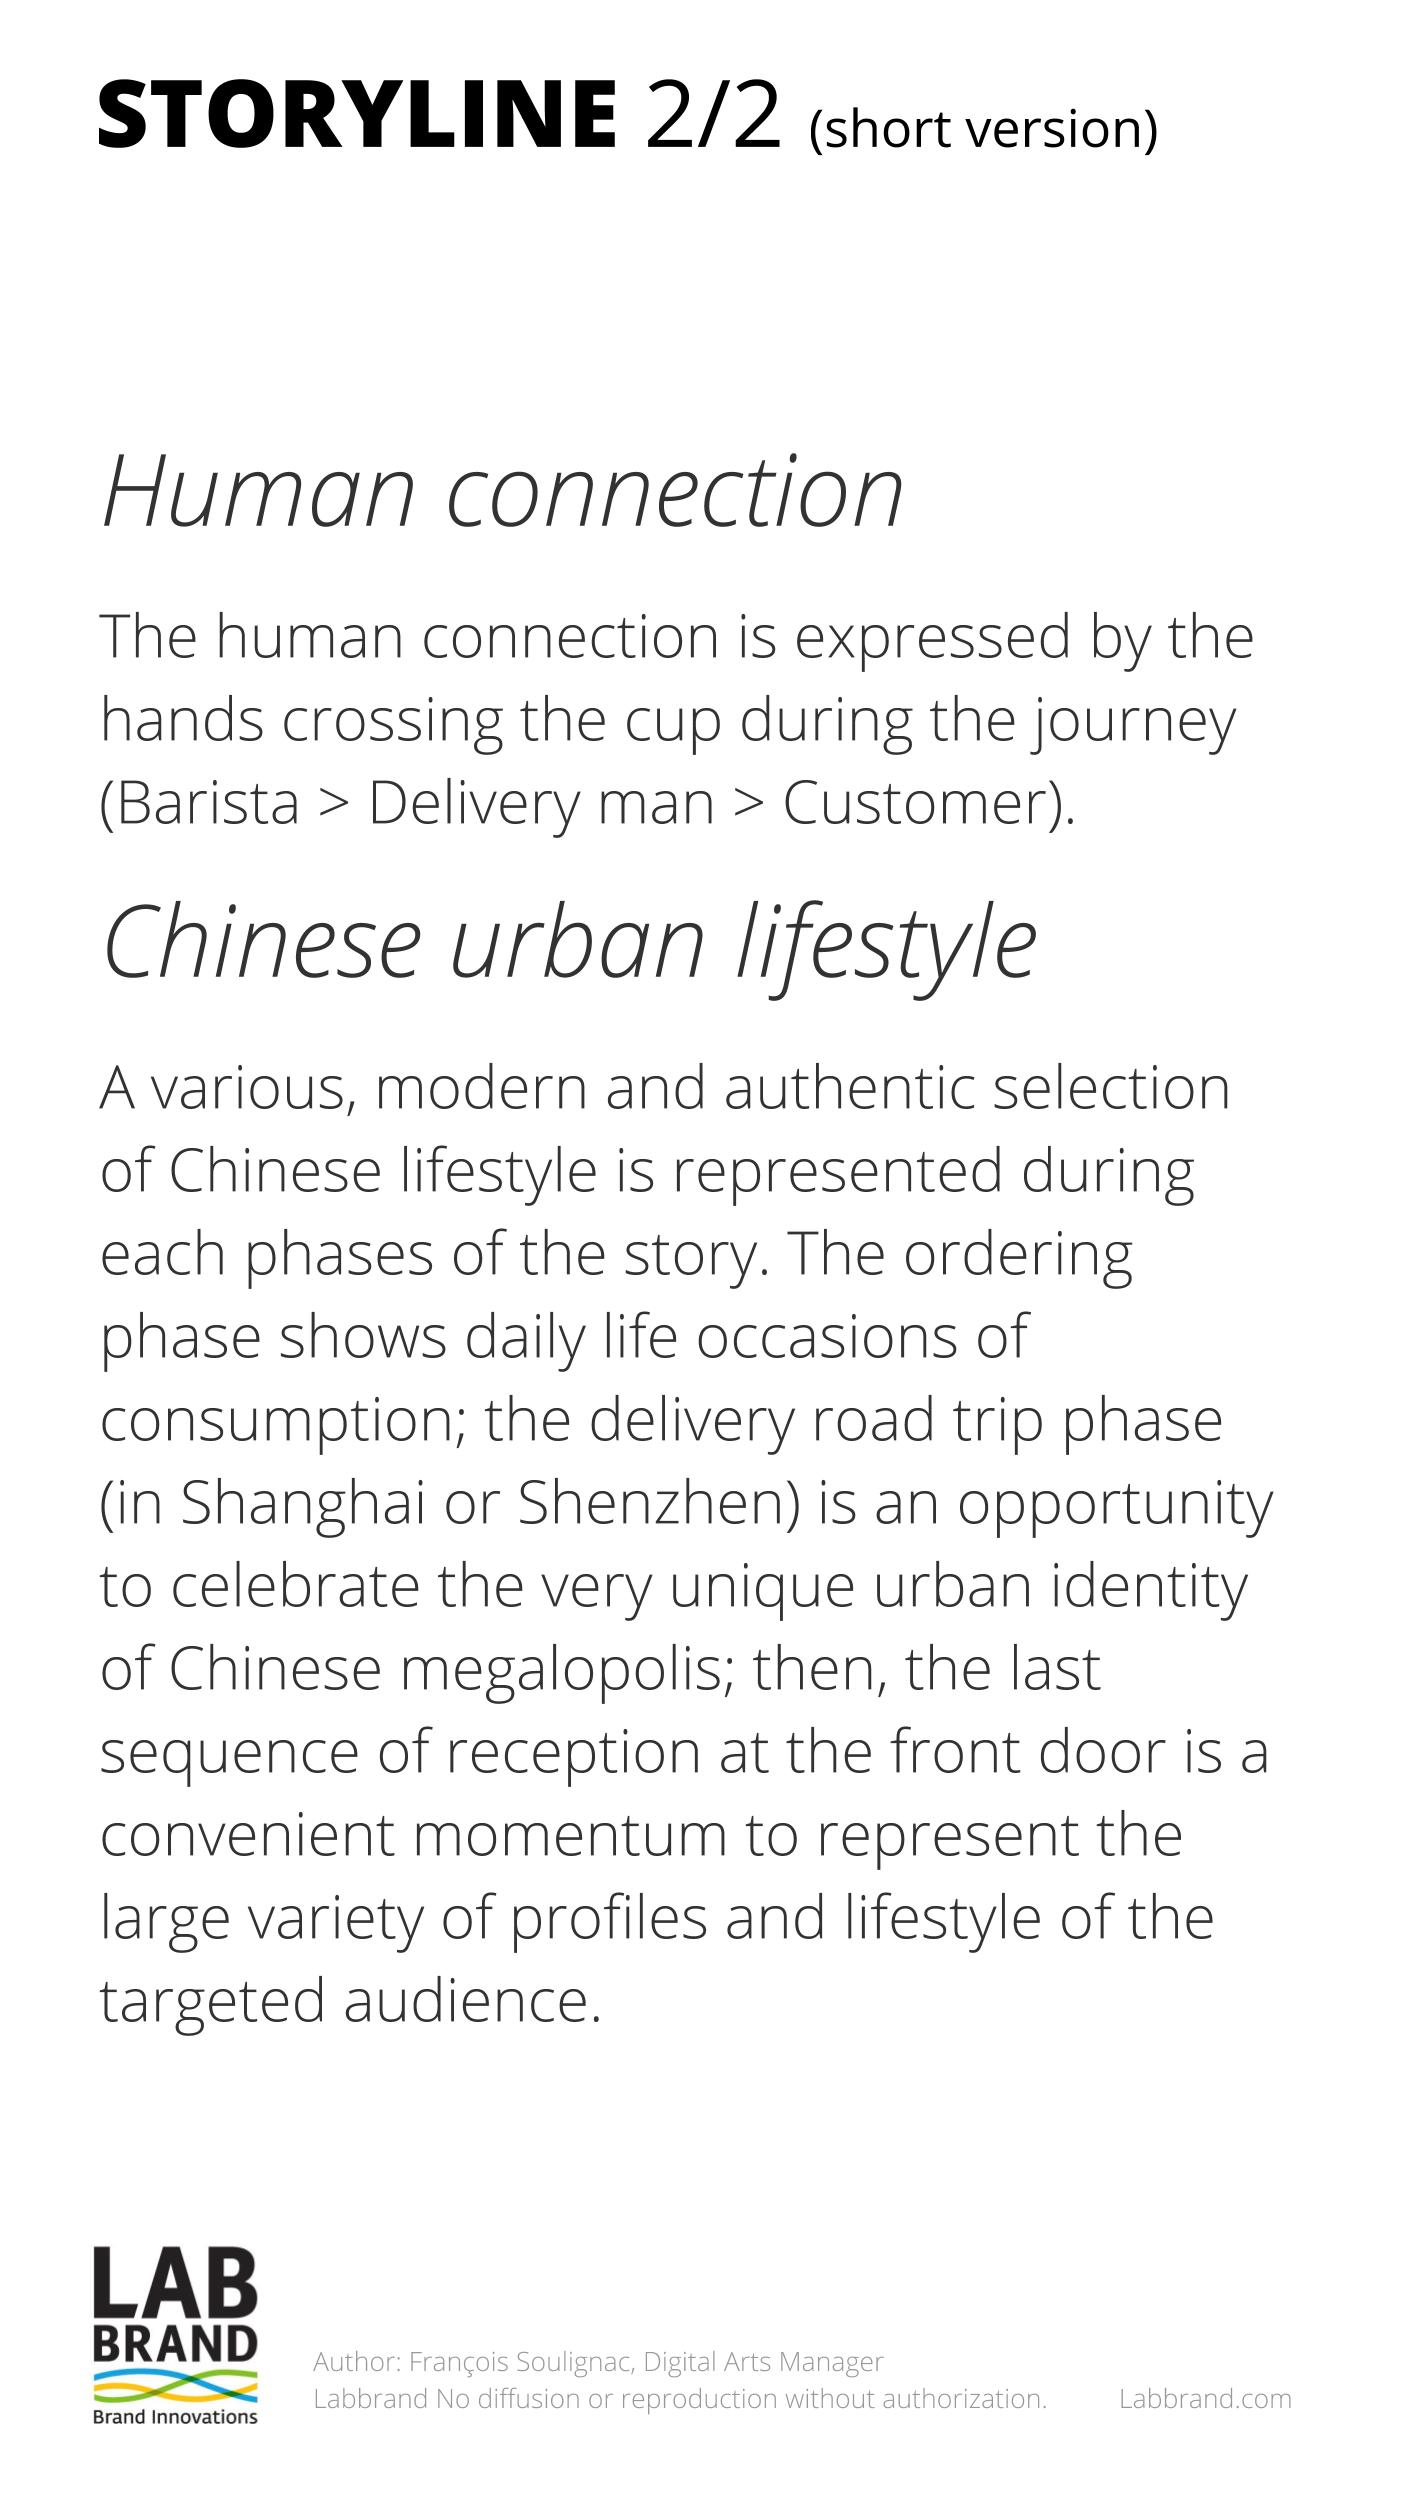 Starbucks China - Delivery Campaign - STORYLINE - Francois Soulignac - MADJOR Labbrand, Shanghai